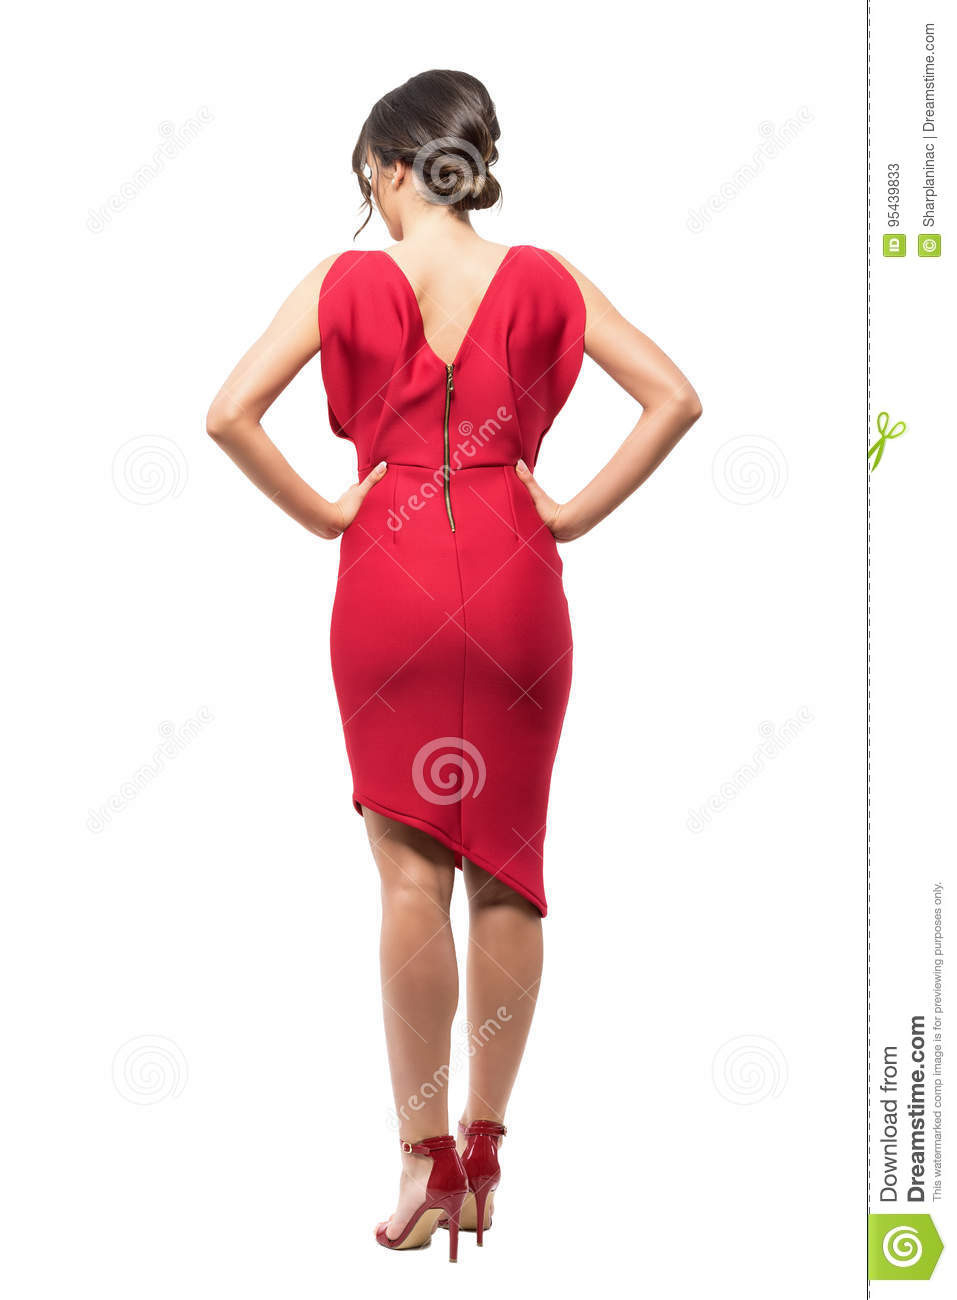 Schön Abendkleid Frau Bester Preis15 Einfach Abendkleid Frau Ärmel